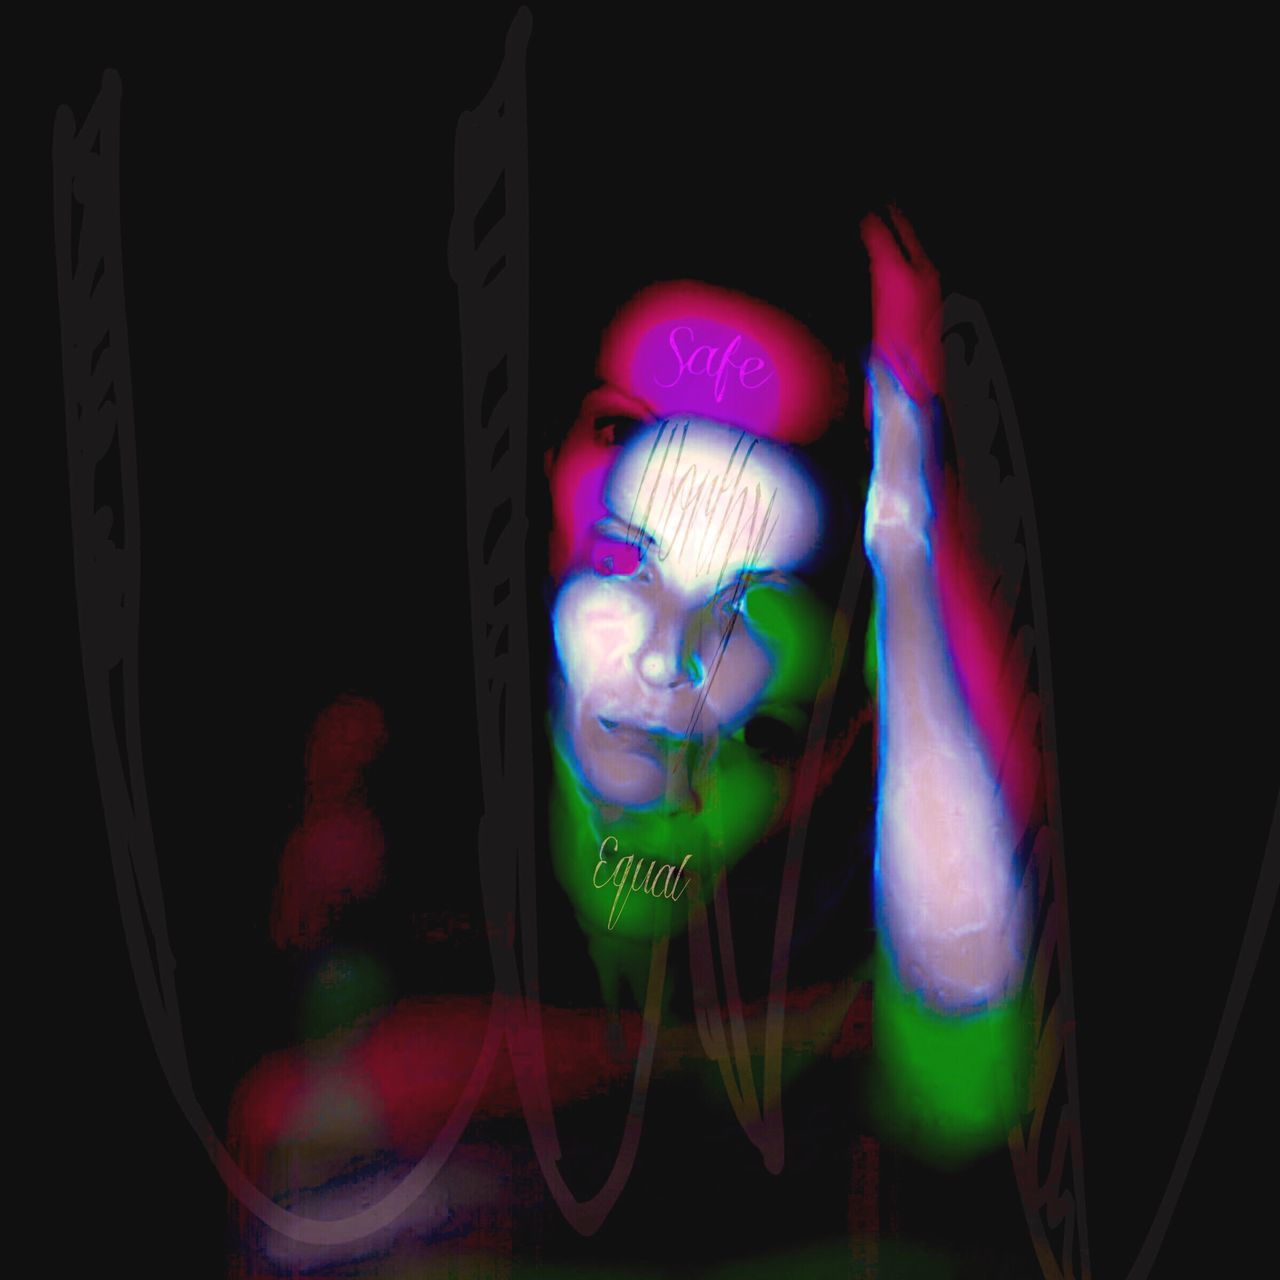 I Hate It When People Make Me Feel Like This Unsafe Unworthy Unequal Women Of EyeEm Faces Of EyeEm Portrait Digital Painting Colour Burst Female Portraits Photomanipulation Self Portrait Scotland Rebelpunk Contemporary Art Photo Manipulation Creative Photography Digitalart  Photo Editing Digital Art Woman Portrait Artist Independent Woman